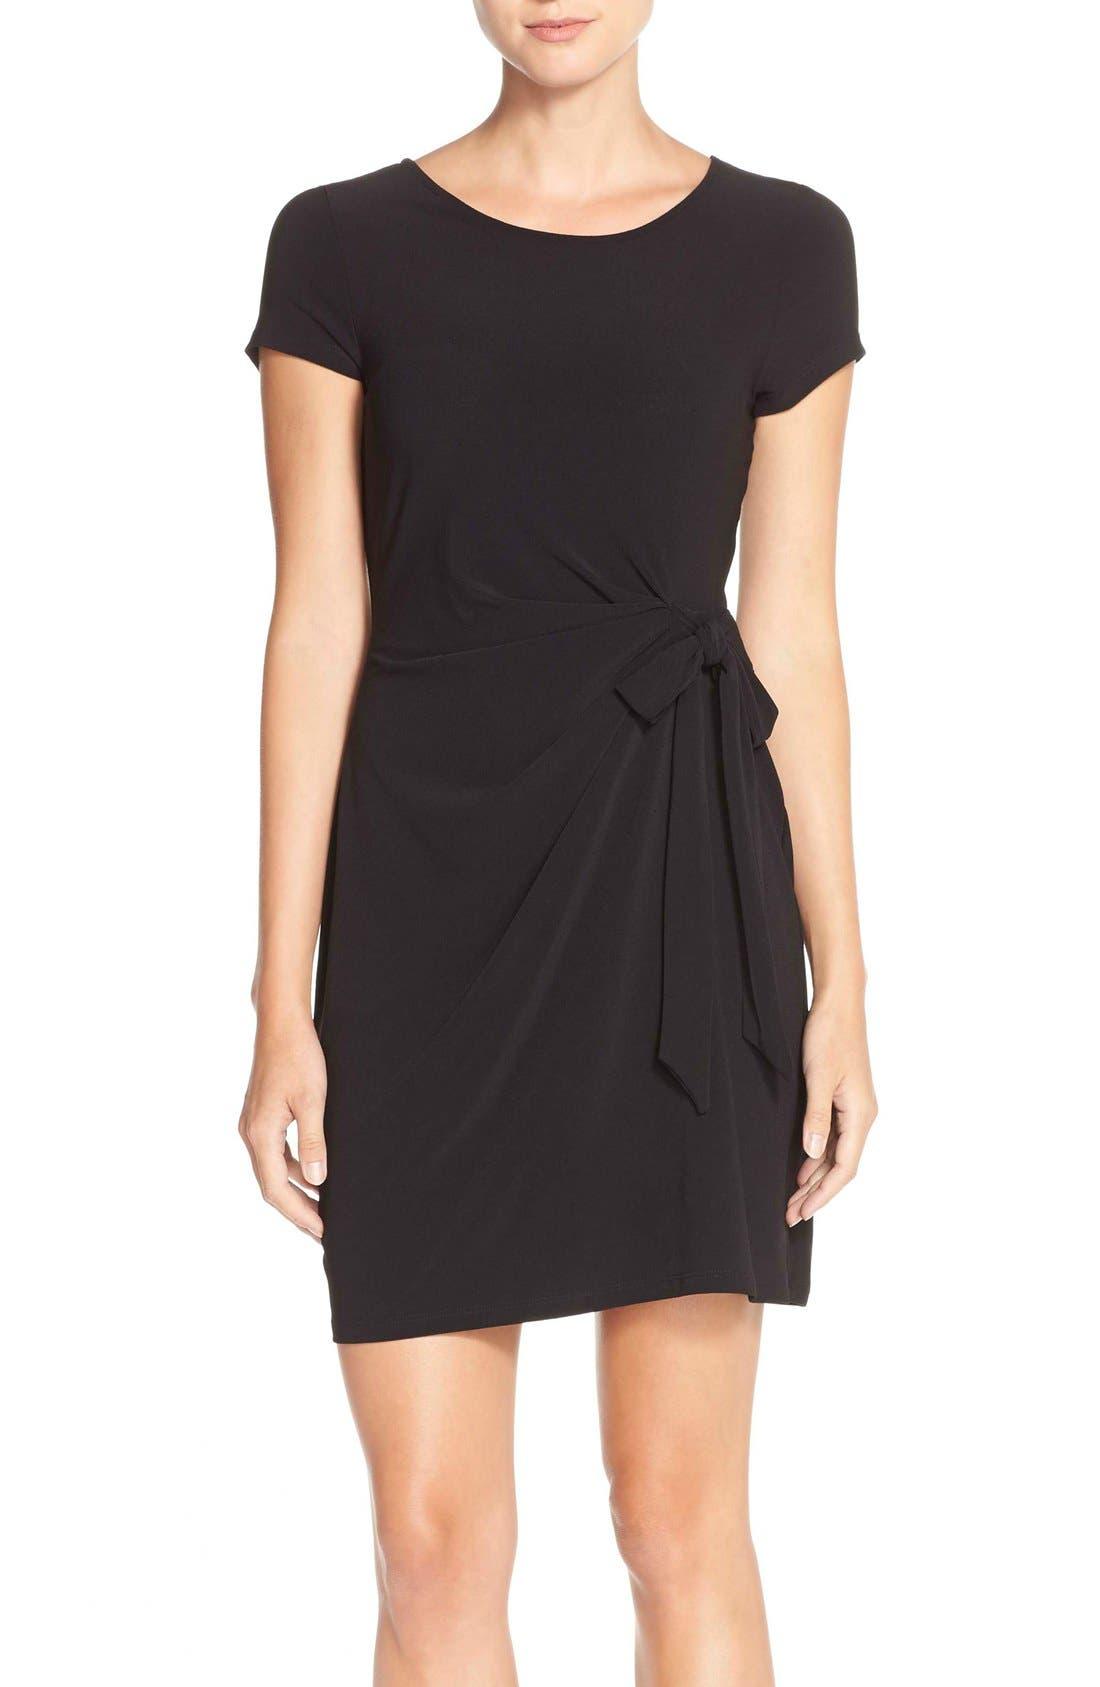 Main Image - Leota Side Tie Jersey Sheath Dress